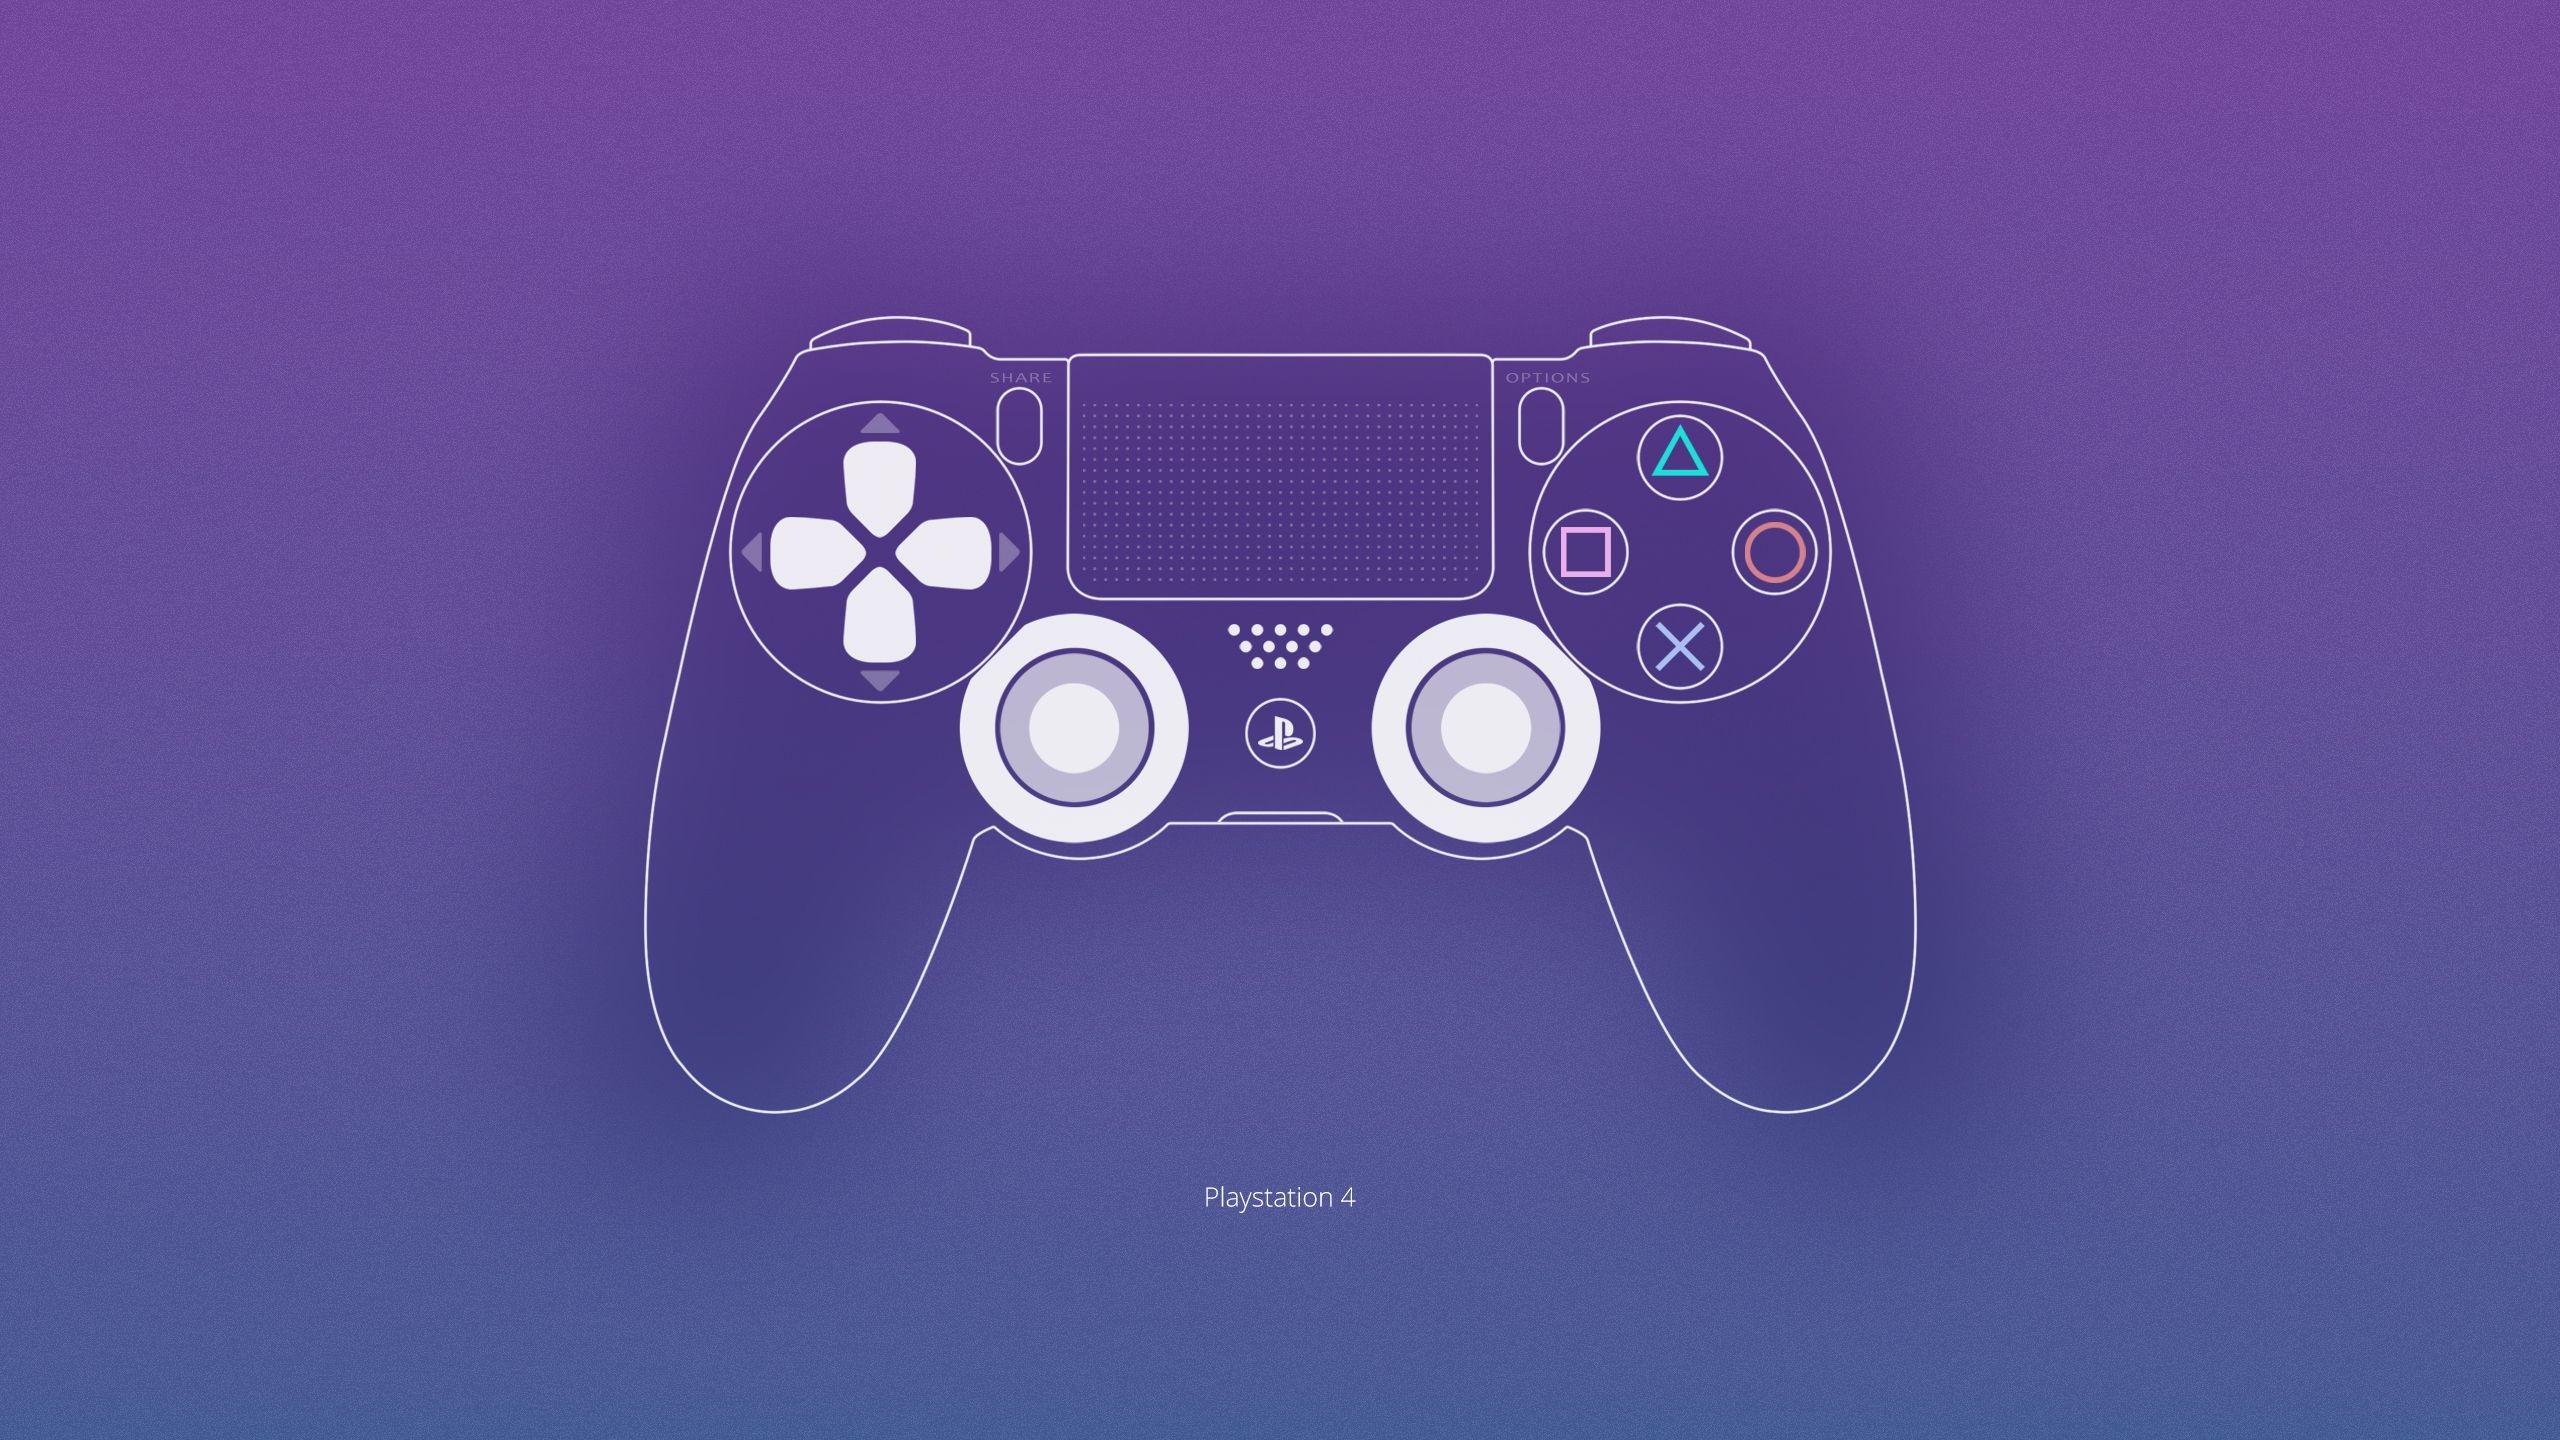 Res: 2560x1440, Playstation 4 Wallpaper by ljdesigner on DeviantArt